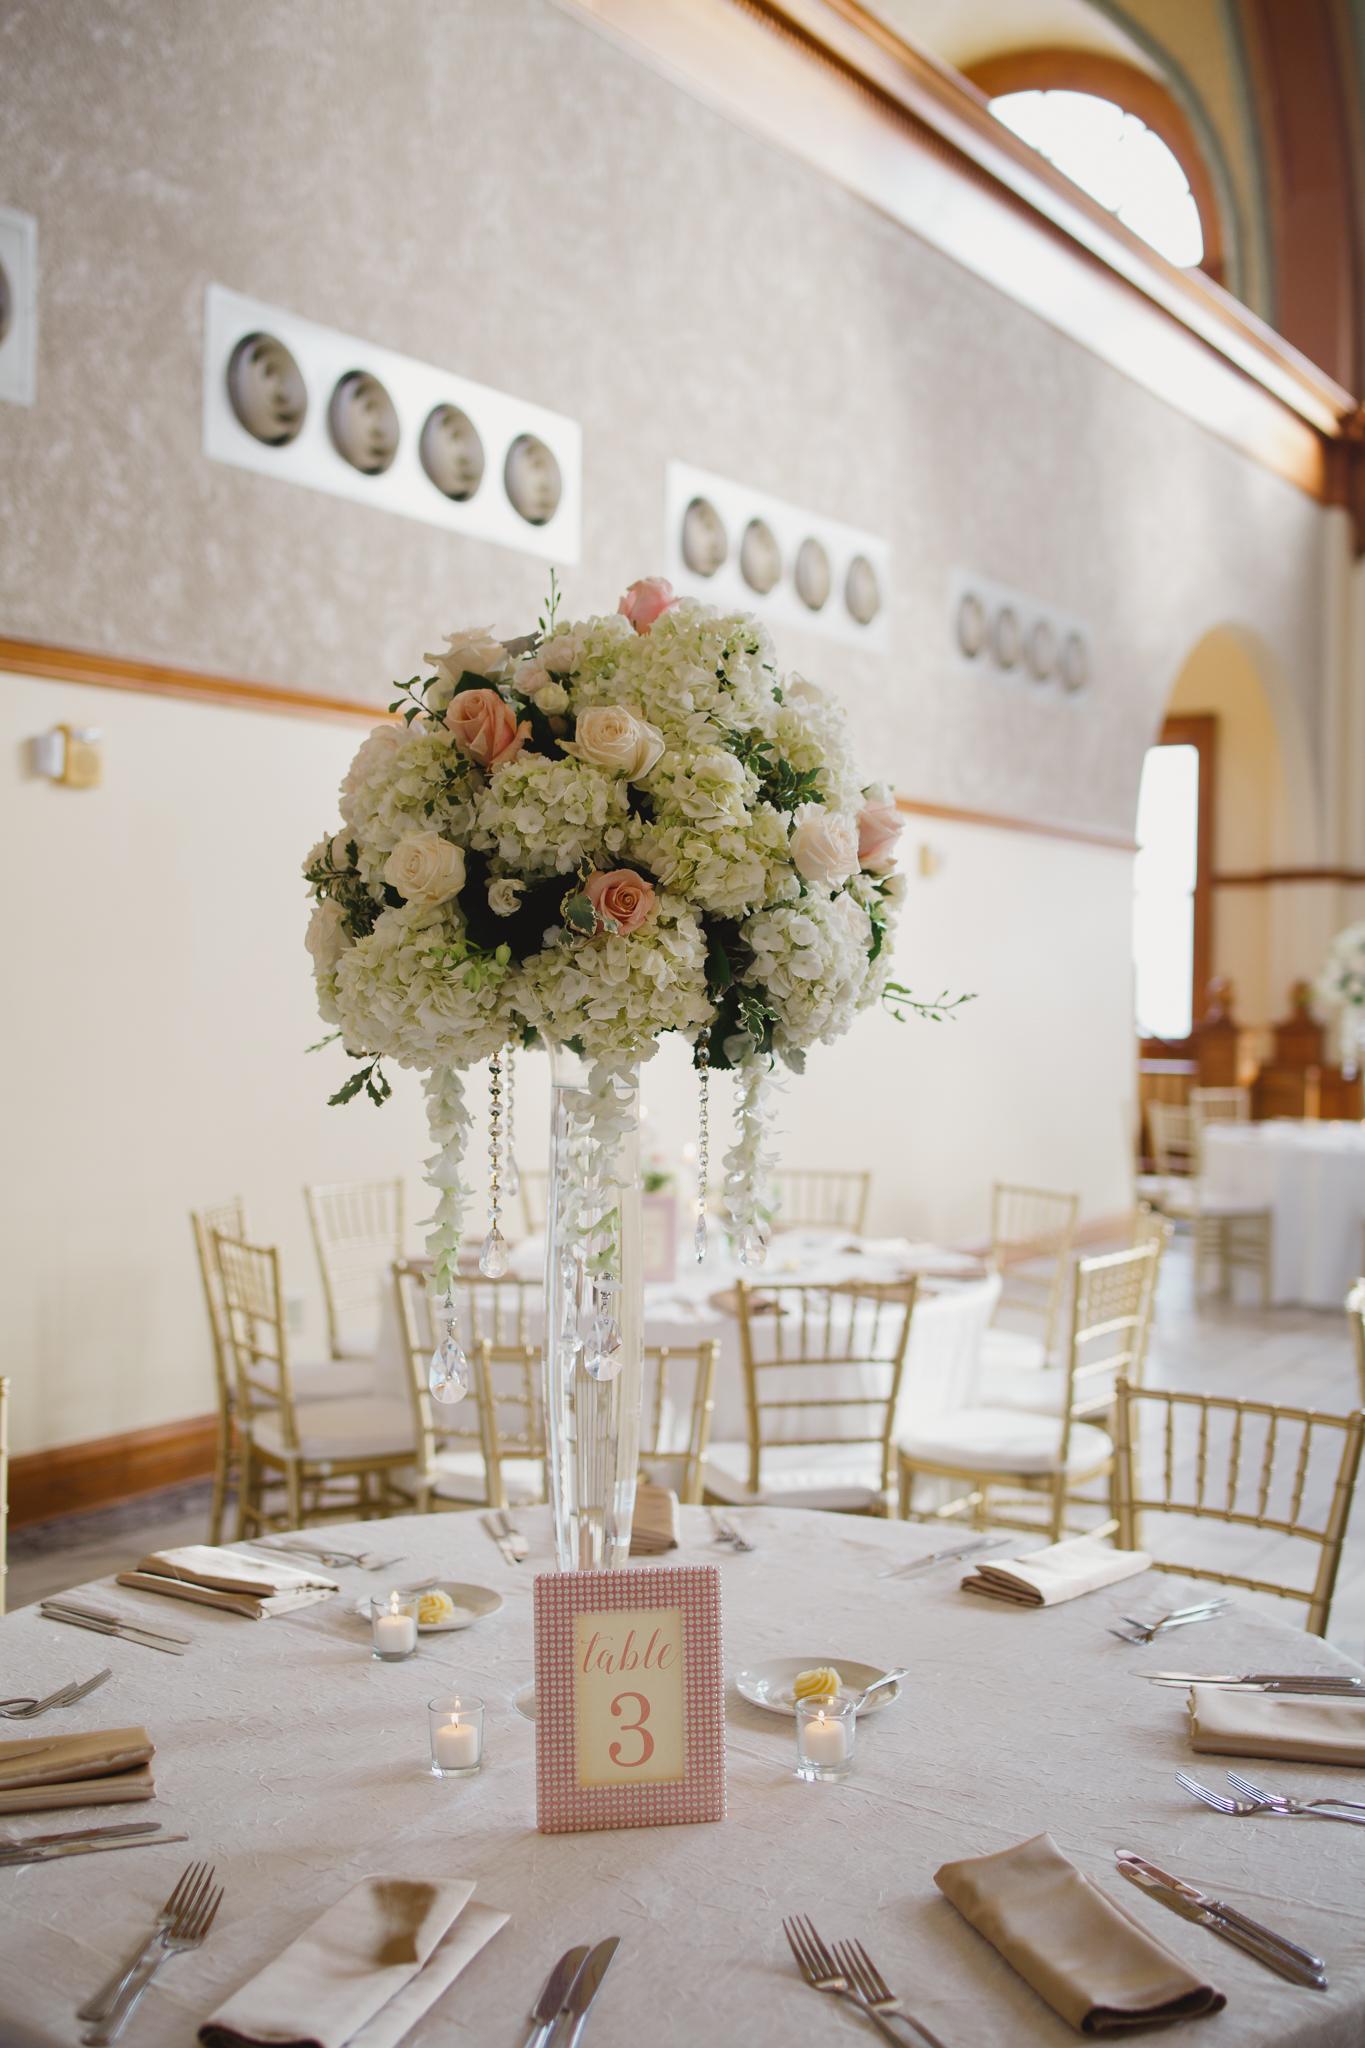 Michael and Kelly - the ashton depot - wedding DFW - wedding photographer- elizalde photography (86 of 150).jpg